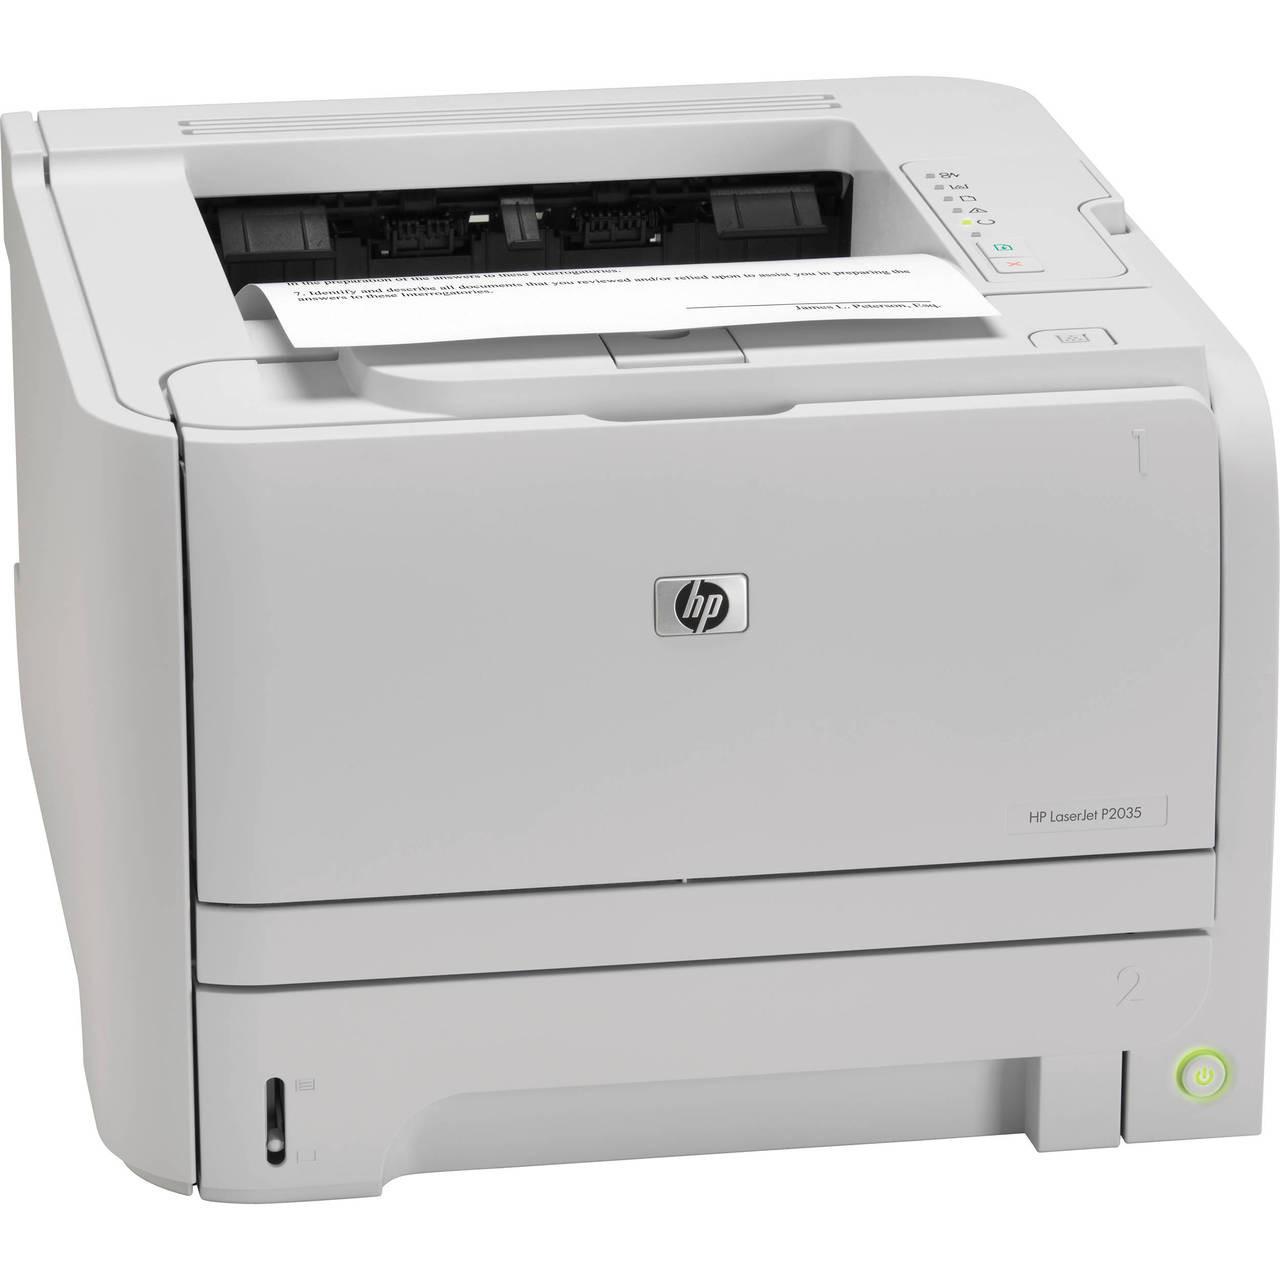 HP LaserJet P2035 - CE461A - HP Printer 2035 for sale